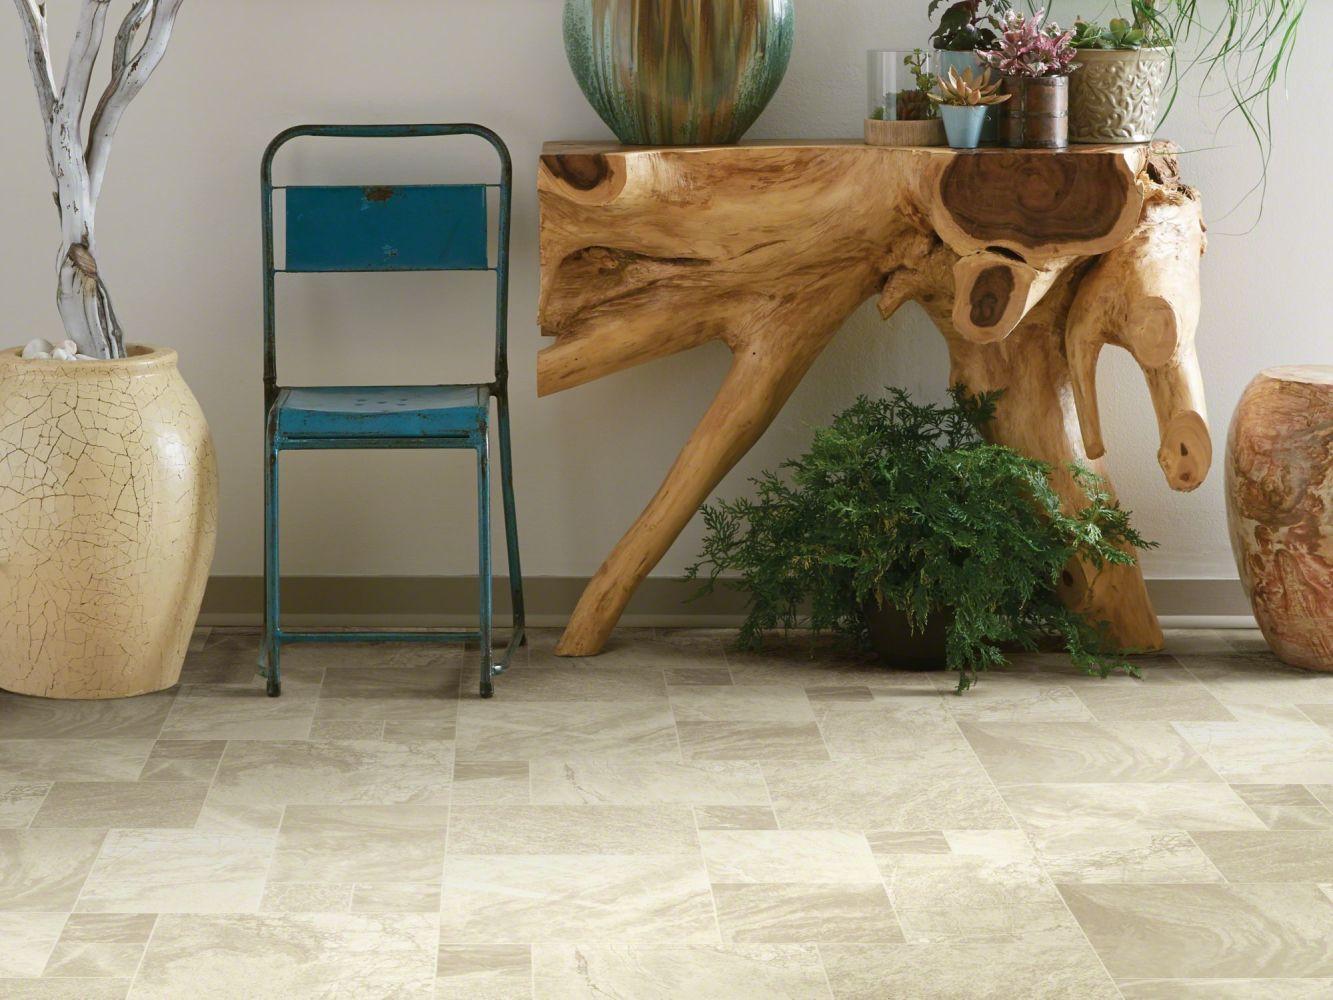 Shaw Floors Resilient Residential Holden Sardis 00112_AR611